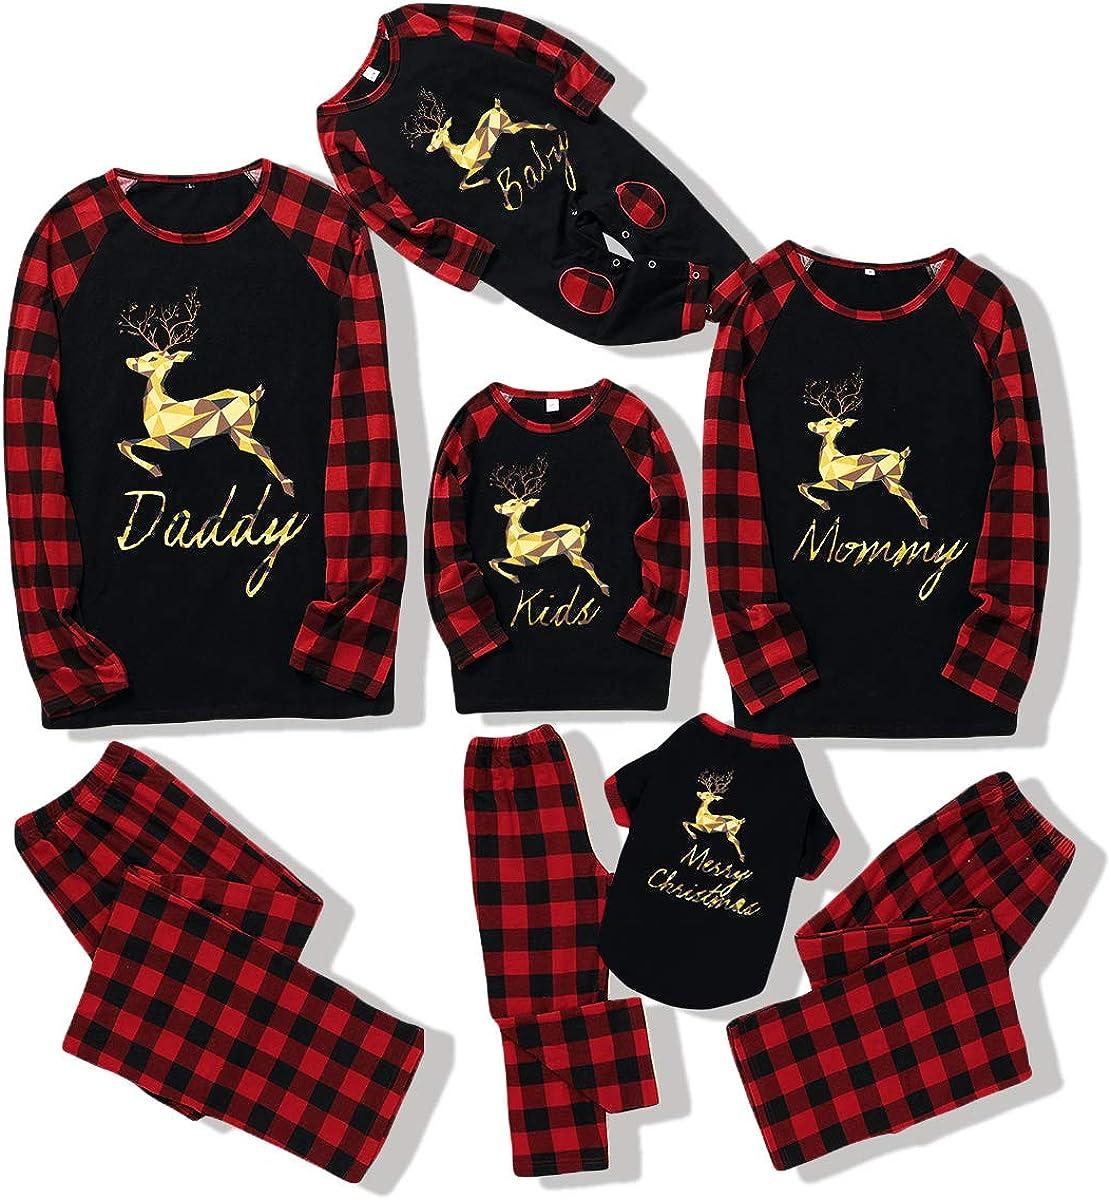 Matching Family Christmas Pajamas Plaid Golden Deer Long Sleeve Printed Xmas Sleepwear Set